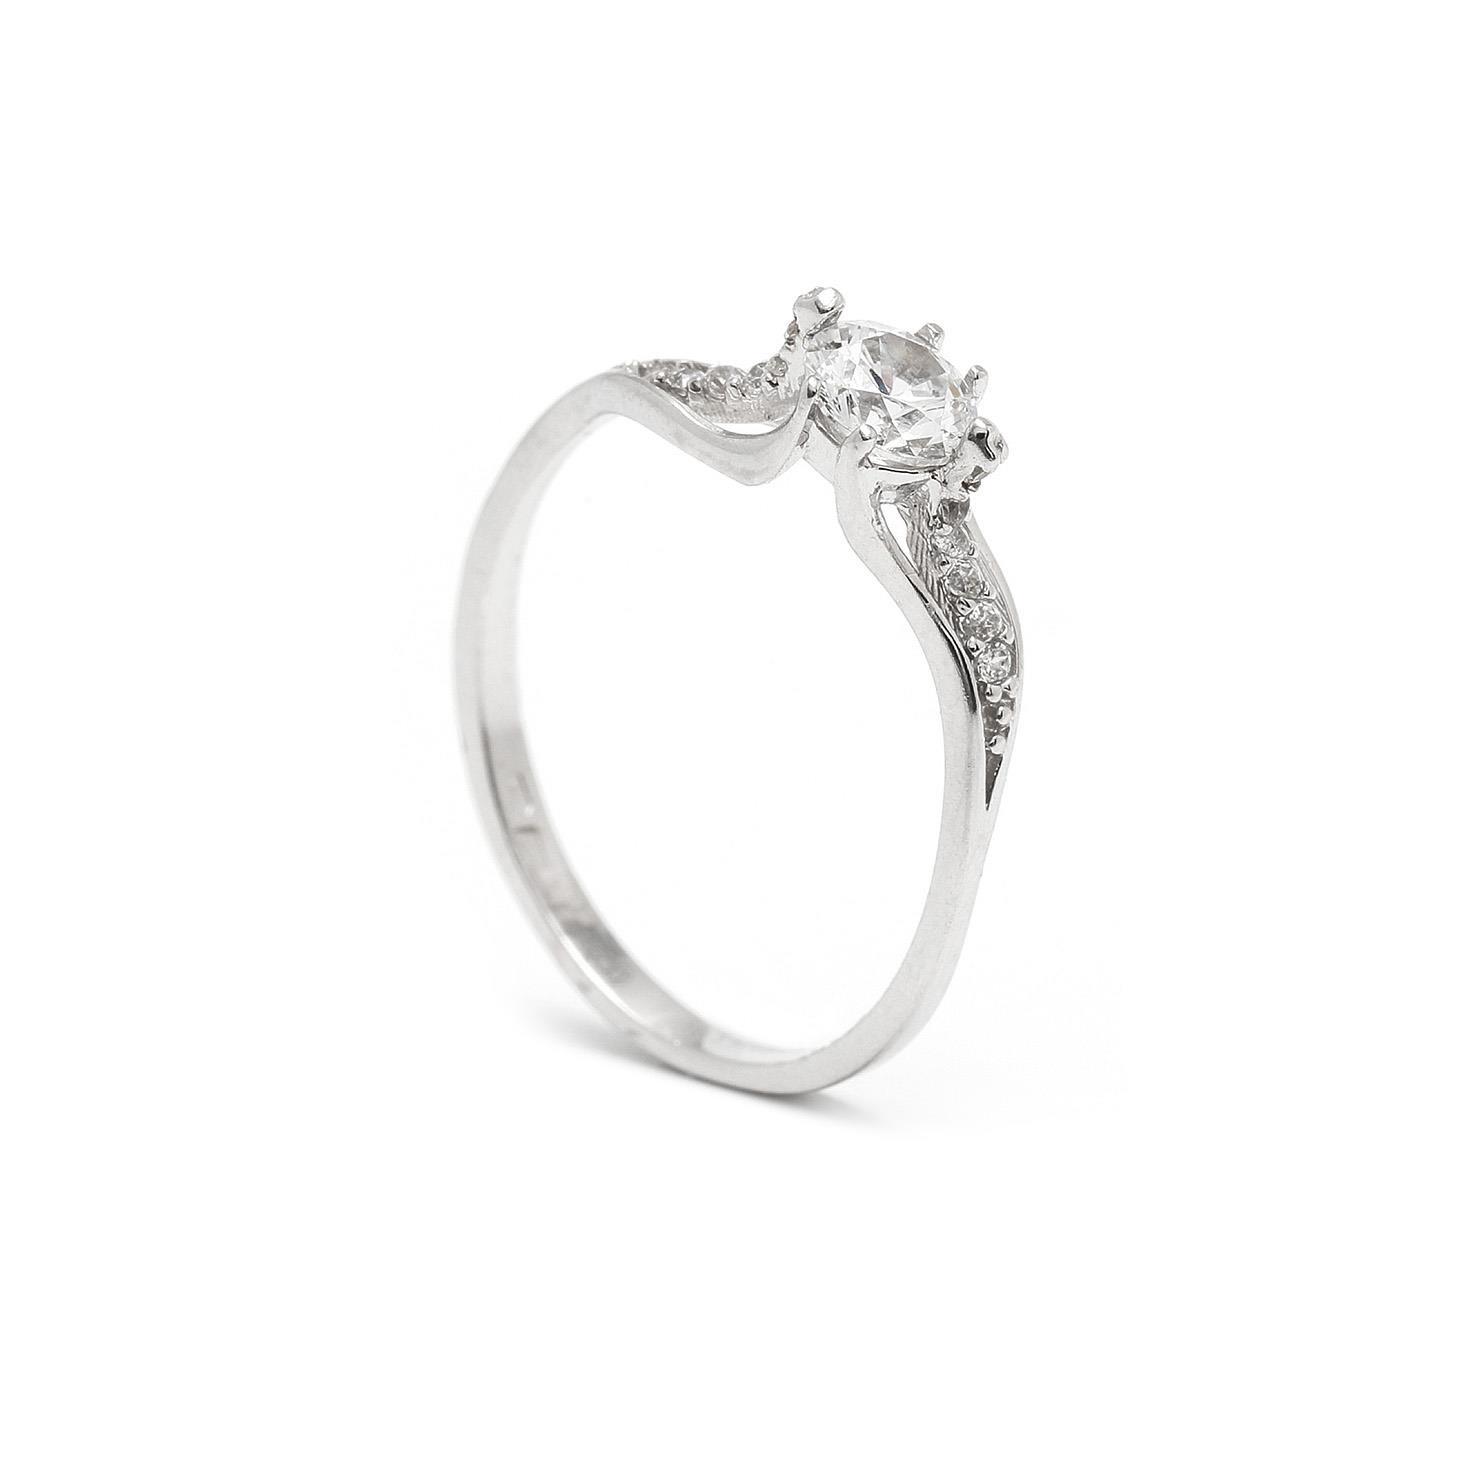 Zlatý zásnubný prsteň MAHALIA 7PB00403 4500f8f99d2